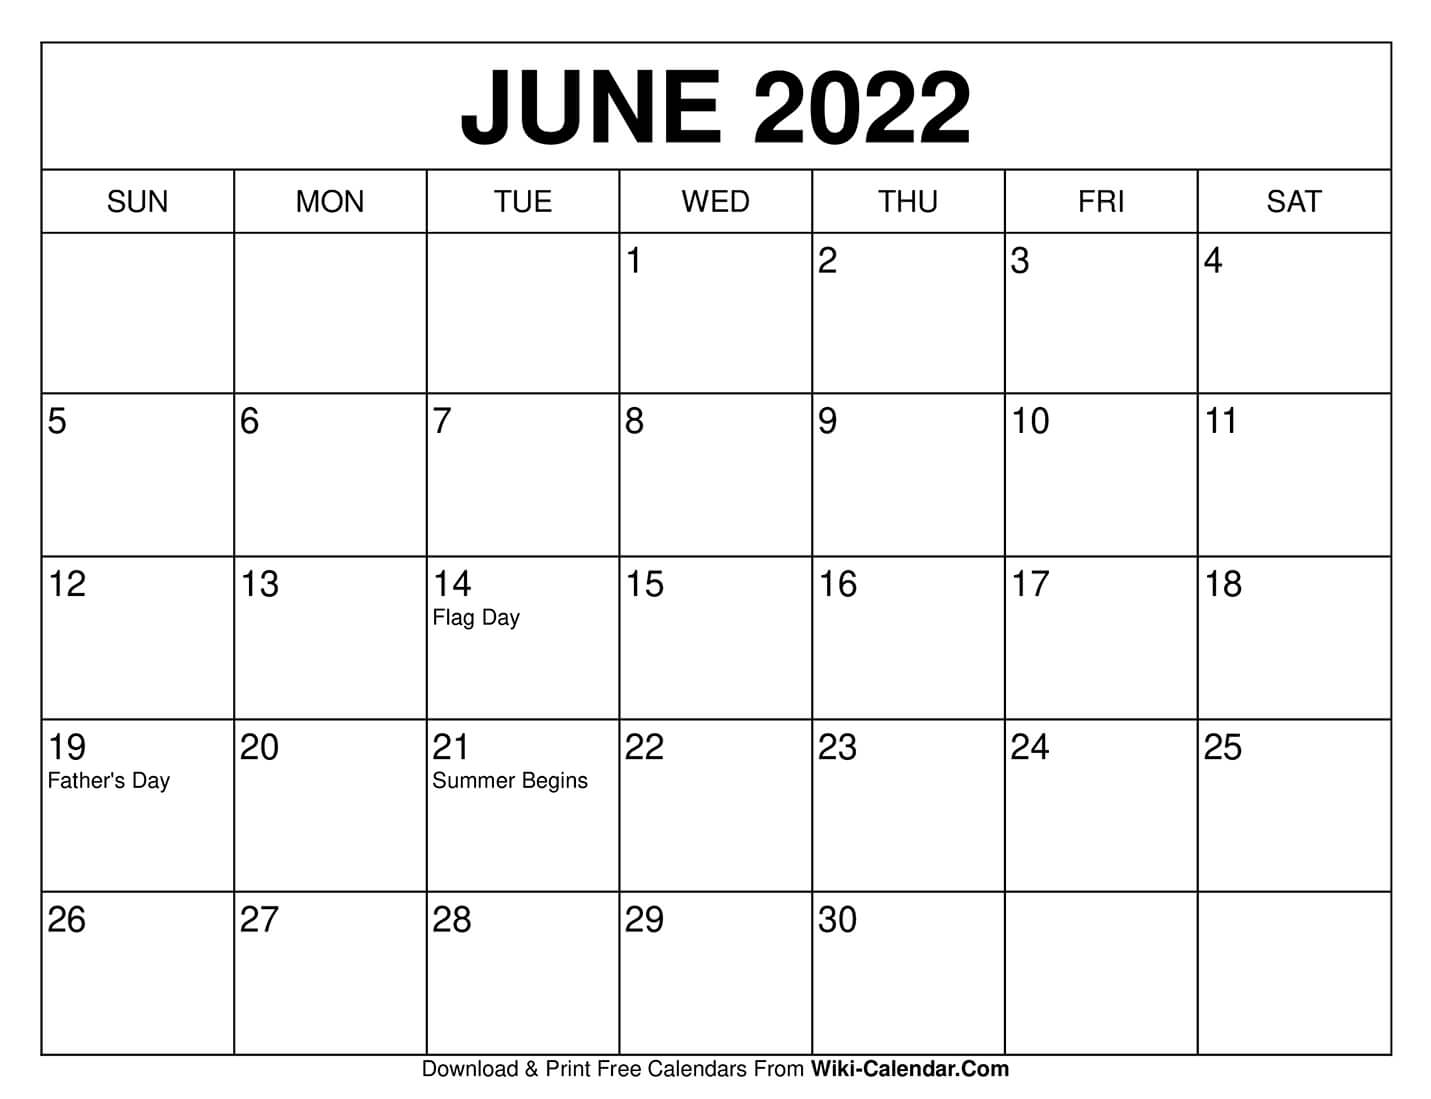 Free Printable June 2020 Calendars with regard to Free Priintable Calendar Day By Day